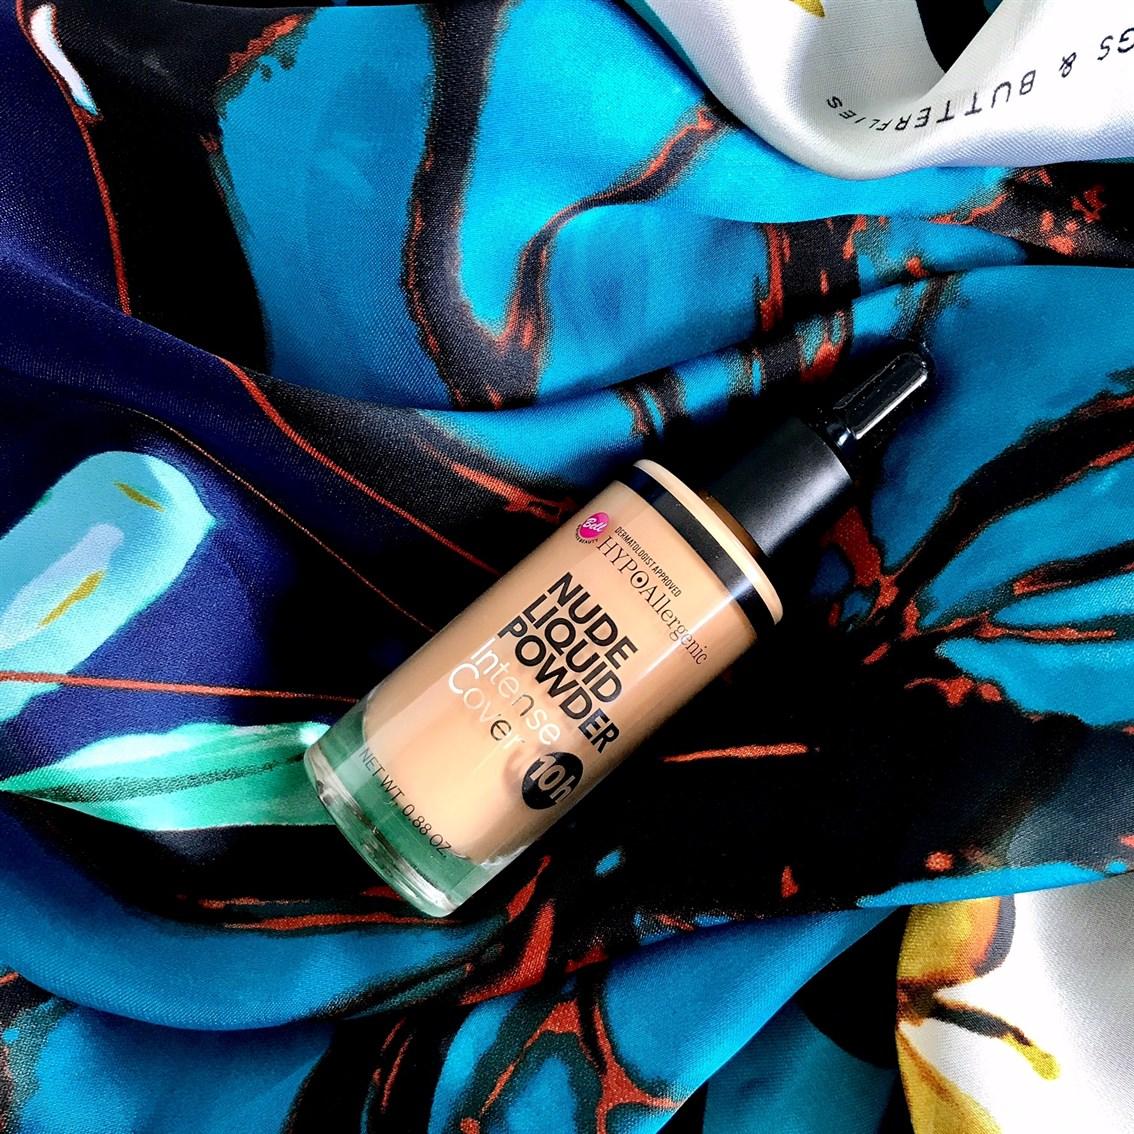 podkład Bell Hypoallergenic Nude Liquid Powder 04 golden beige